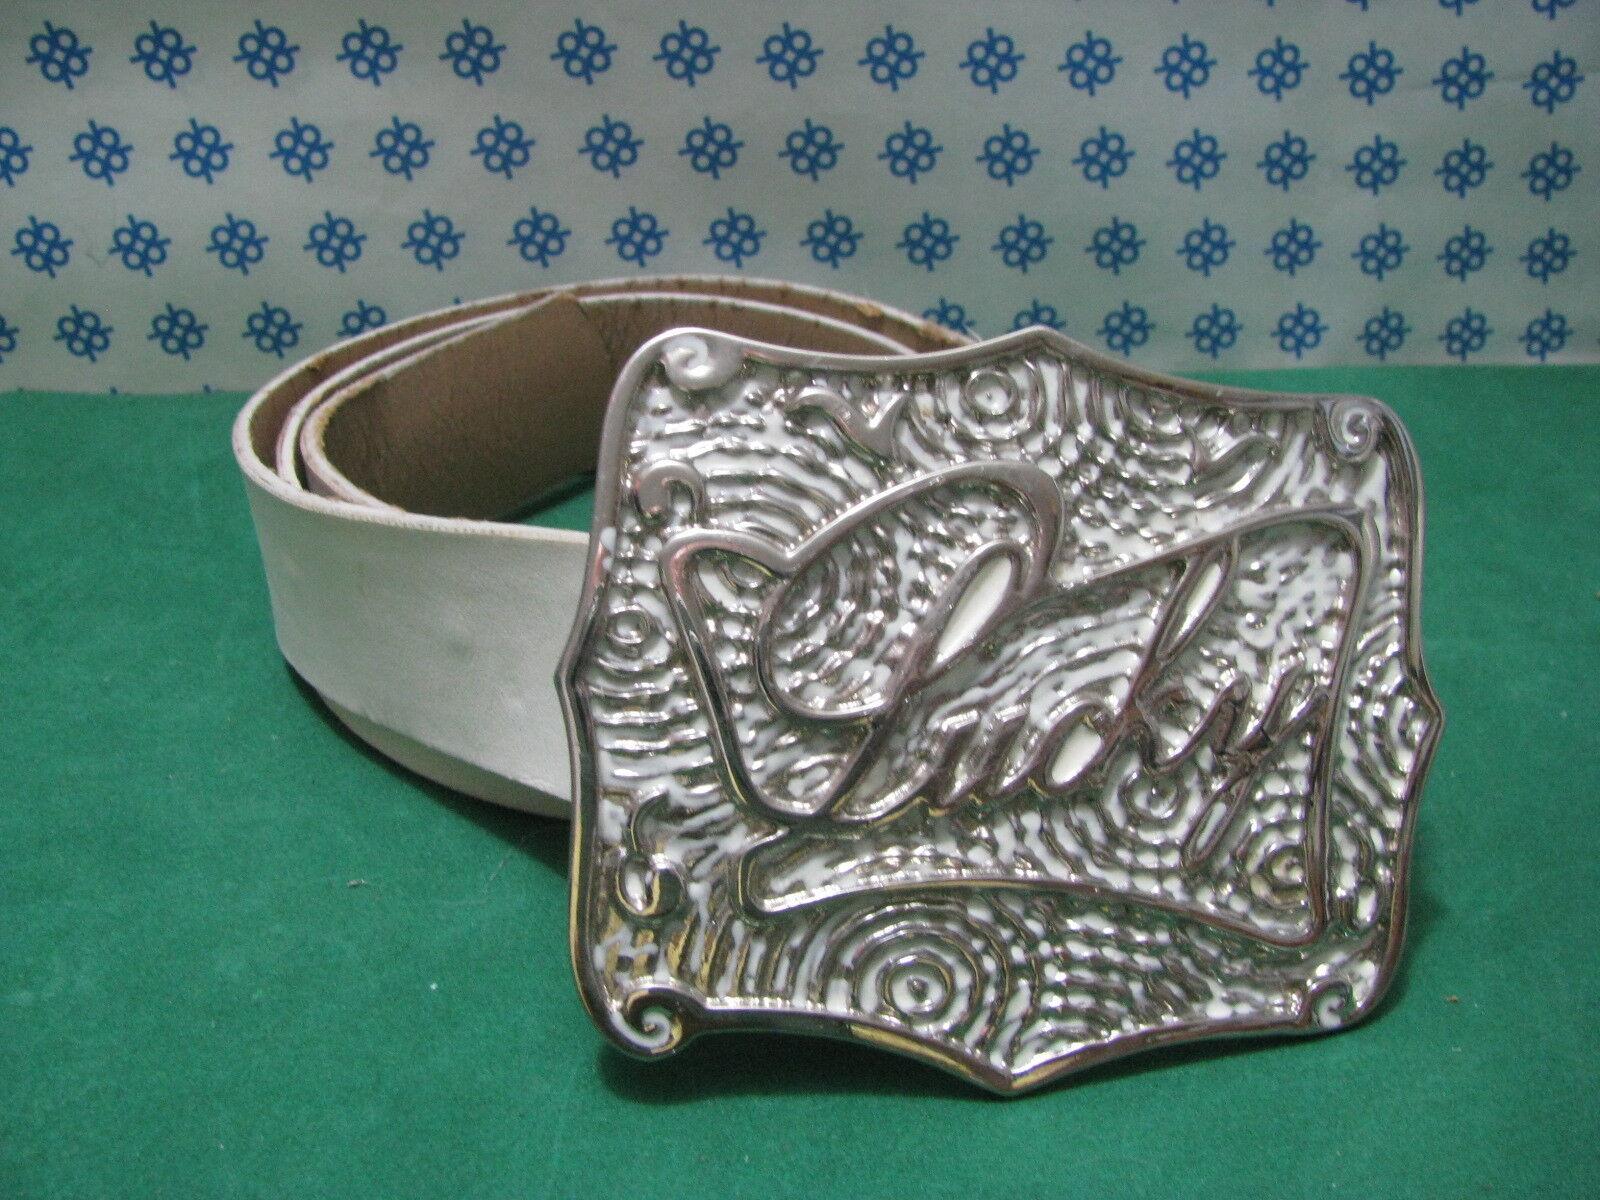 Frau Gürtel Echtes Leder Weiß Cm.105 X Cm.4 - La Flaca - Italy